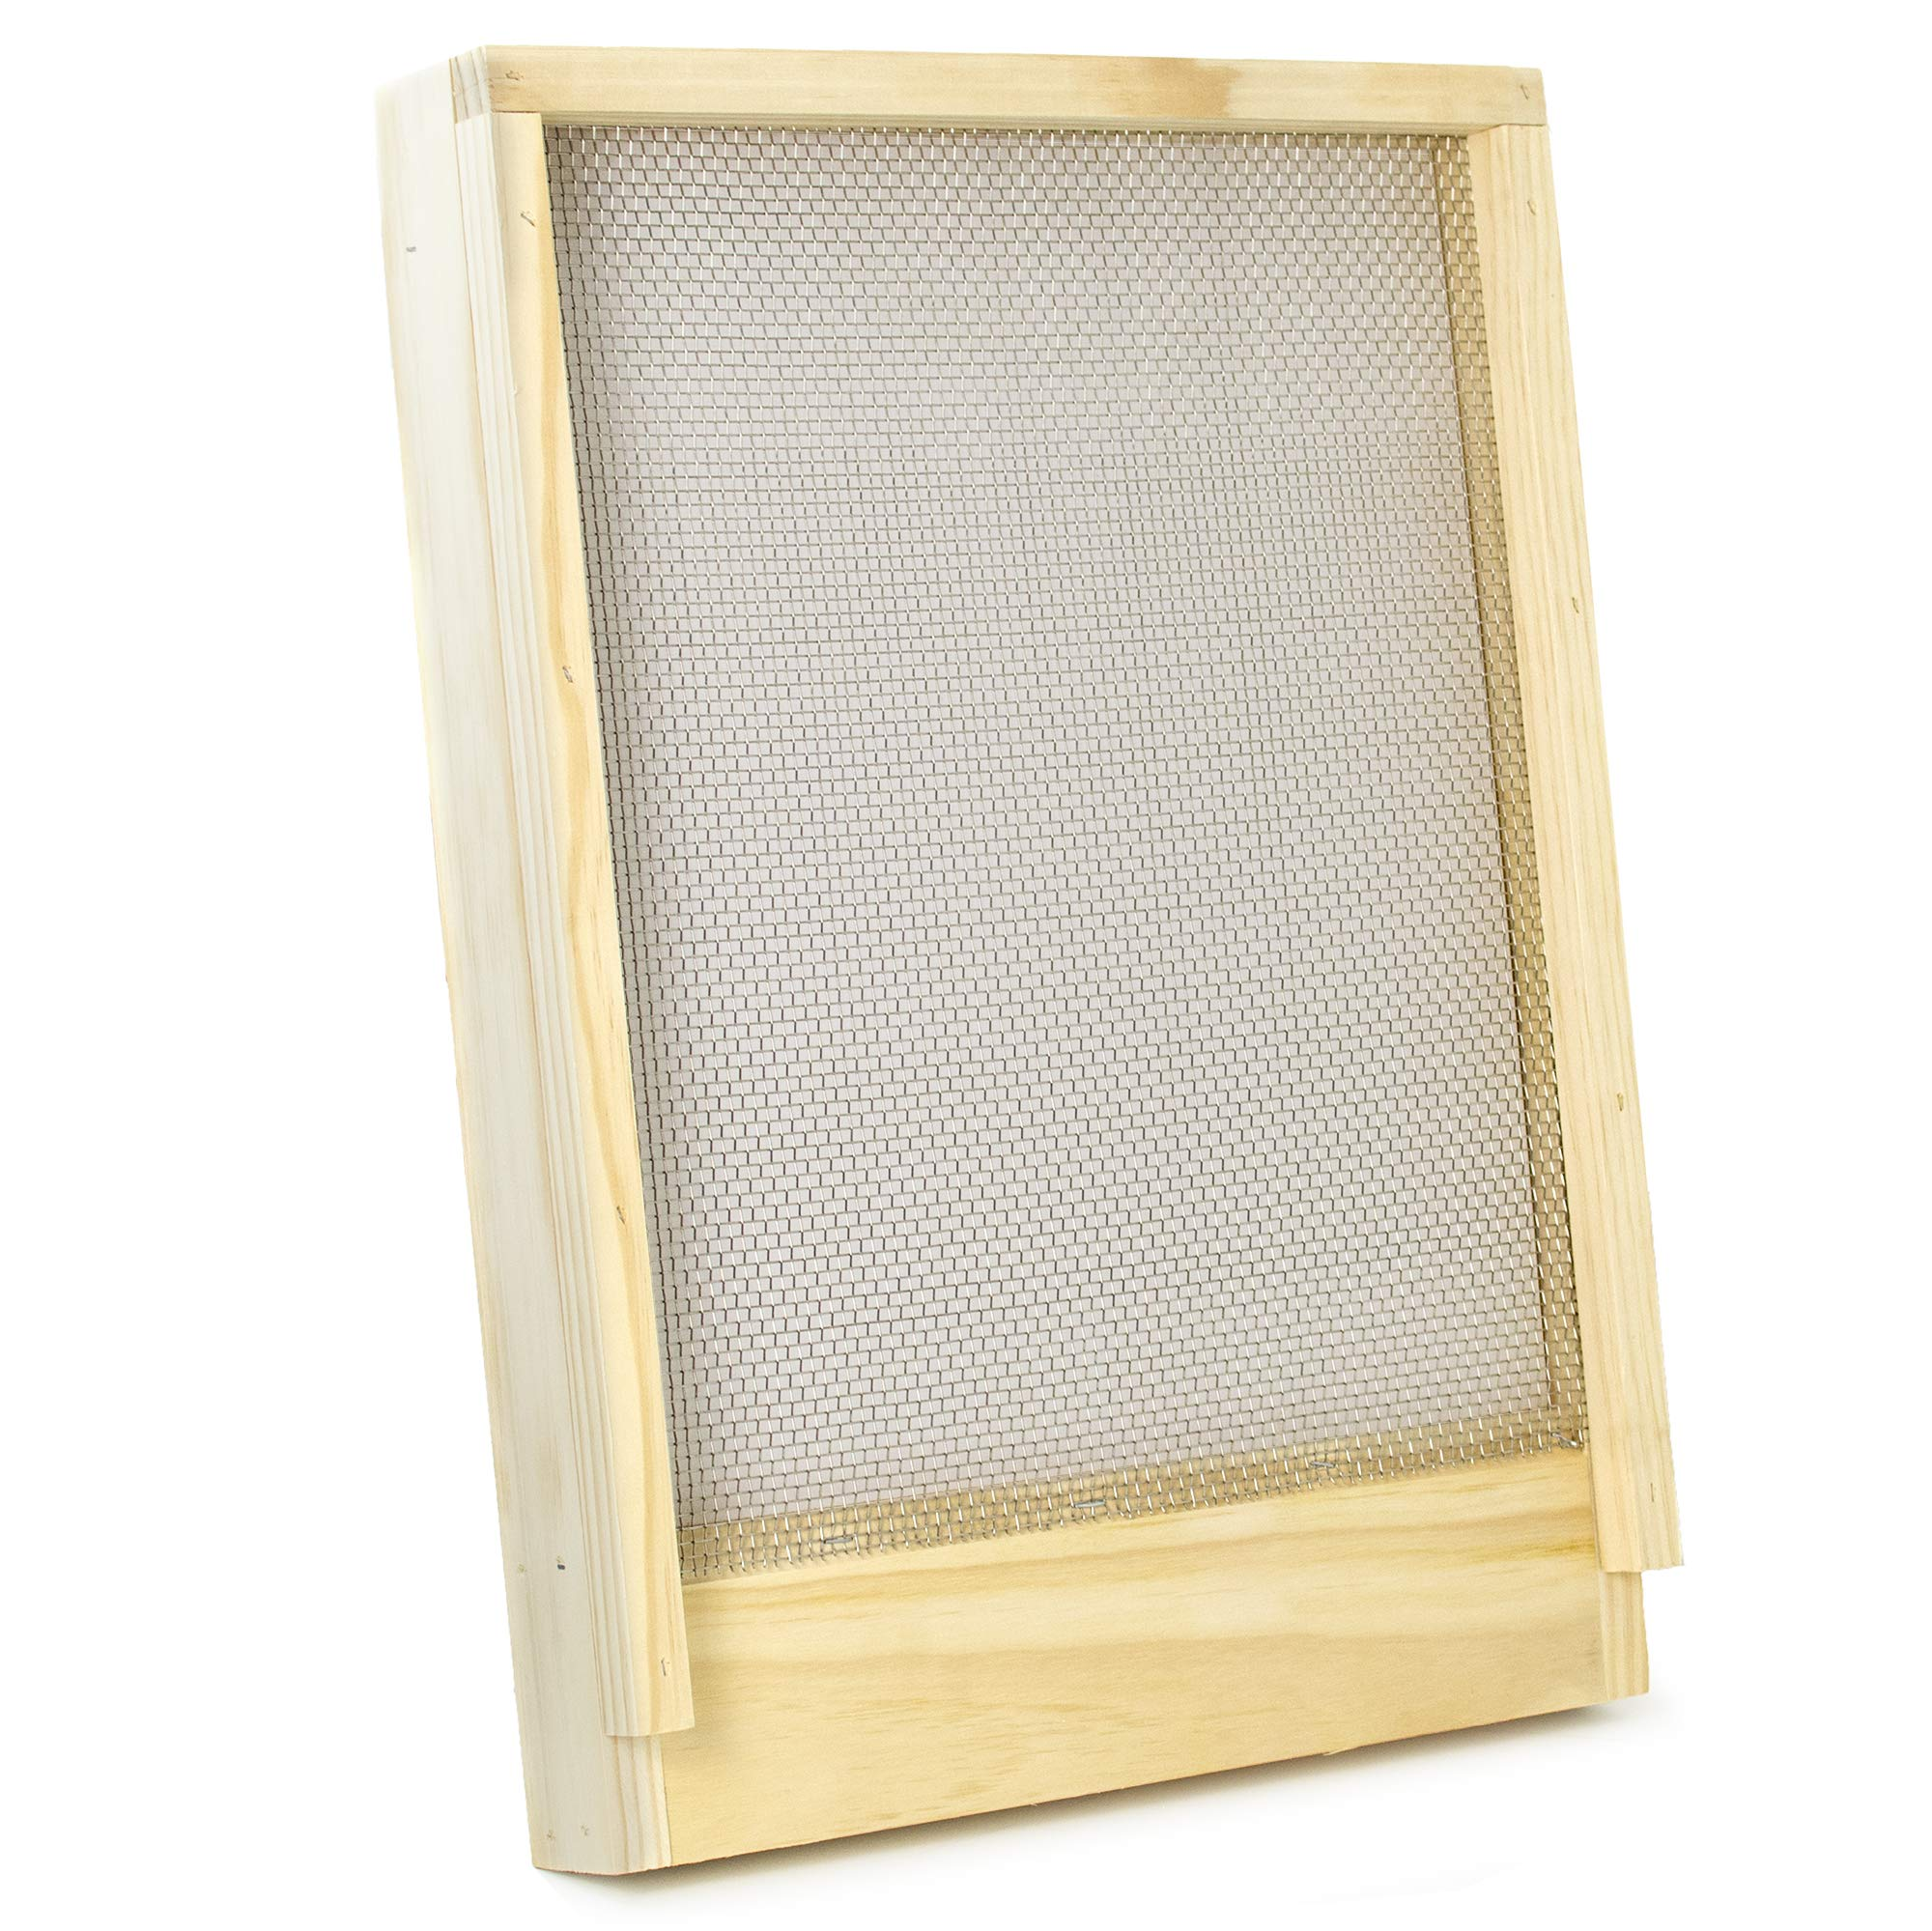 VIVO Screened Bottom Board Frame for Langstroth Beehive | Beekeeping Hive Screen Tool (BEE-HV00SC) by VIVO